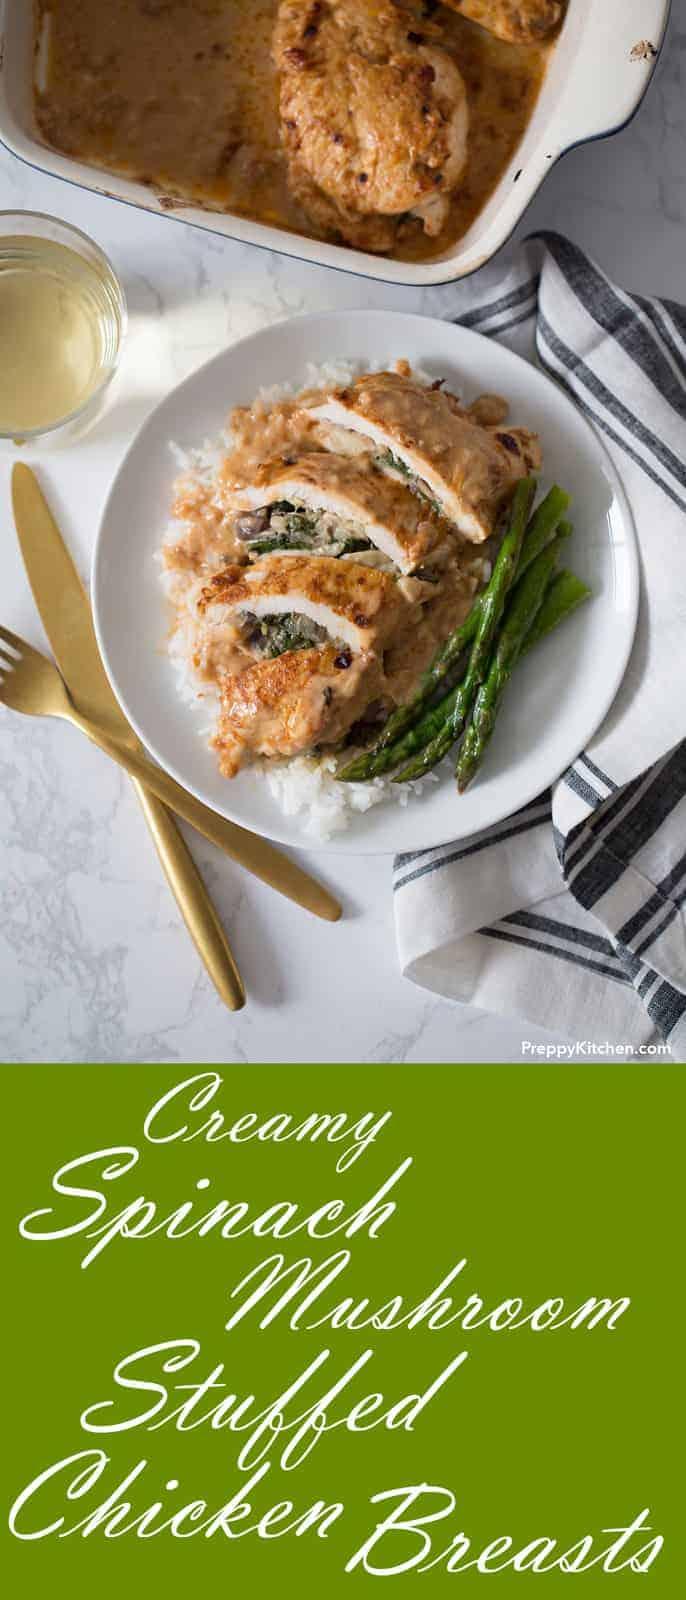 Creamy Spinach Mushroom Stuffed Chicken Breasts